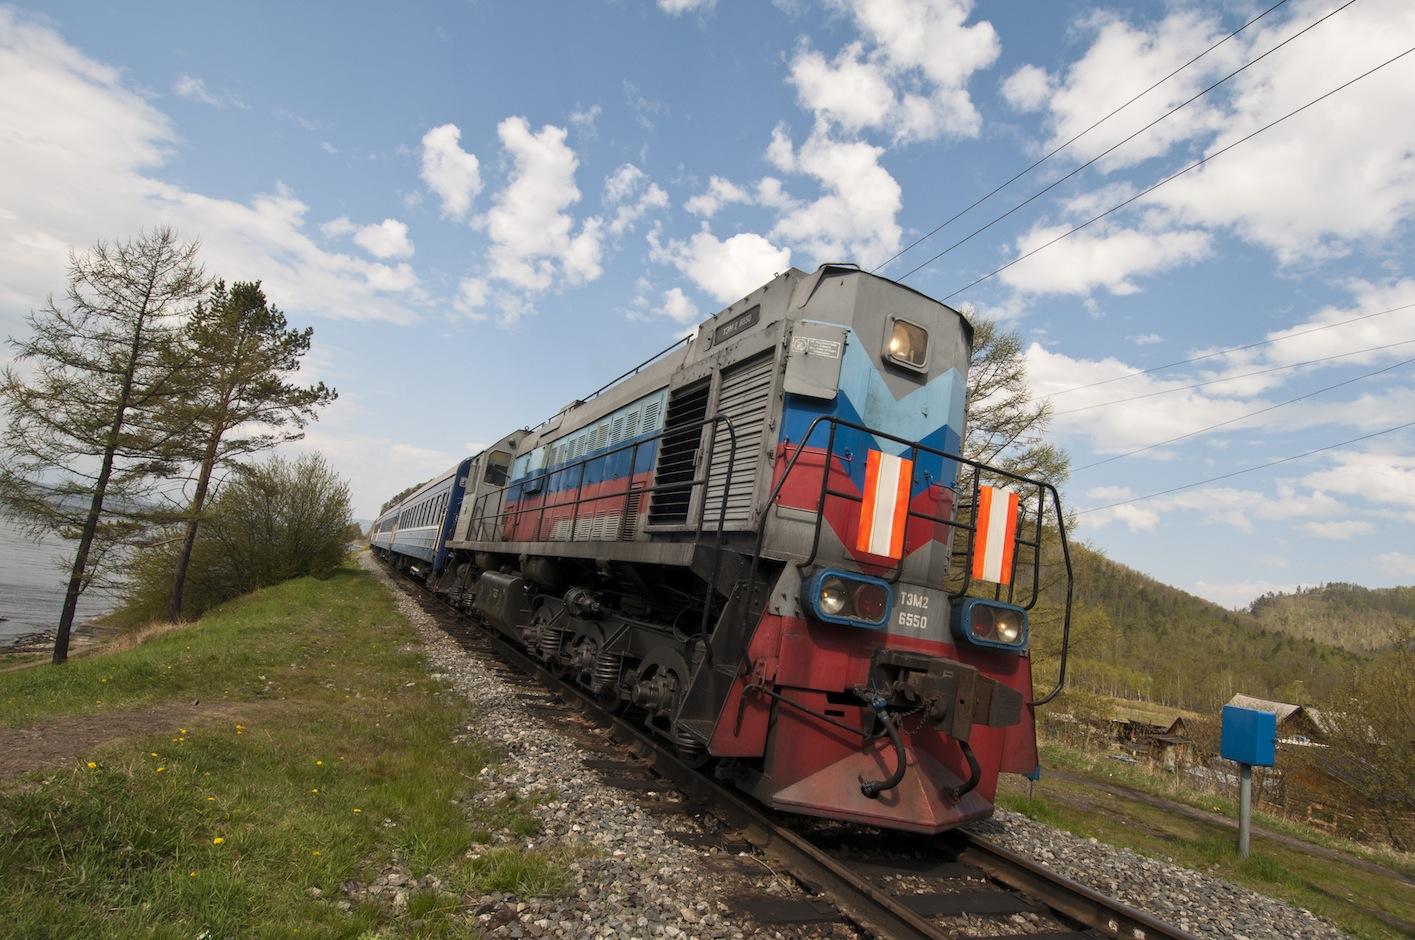 Trans Siberian Express Tours